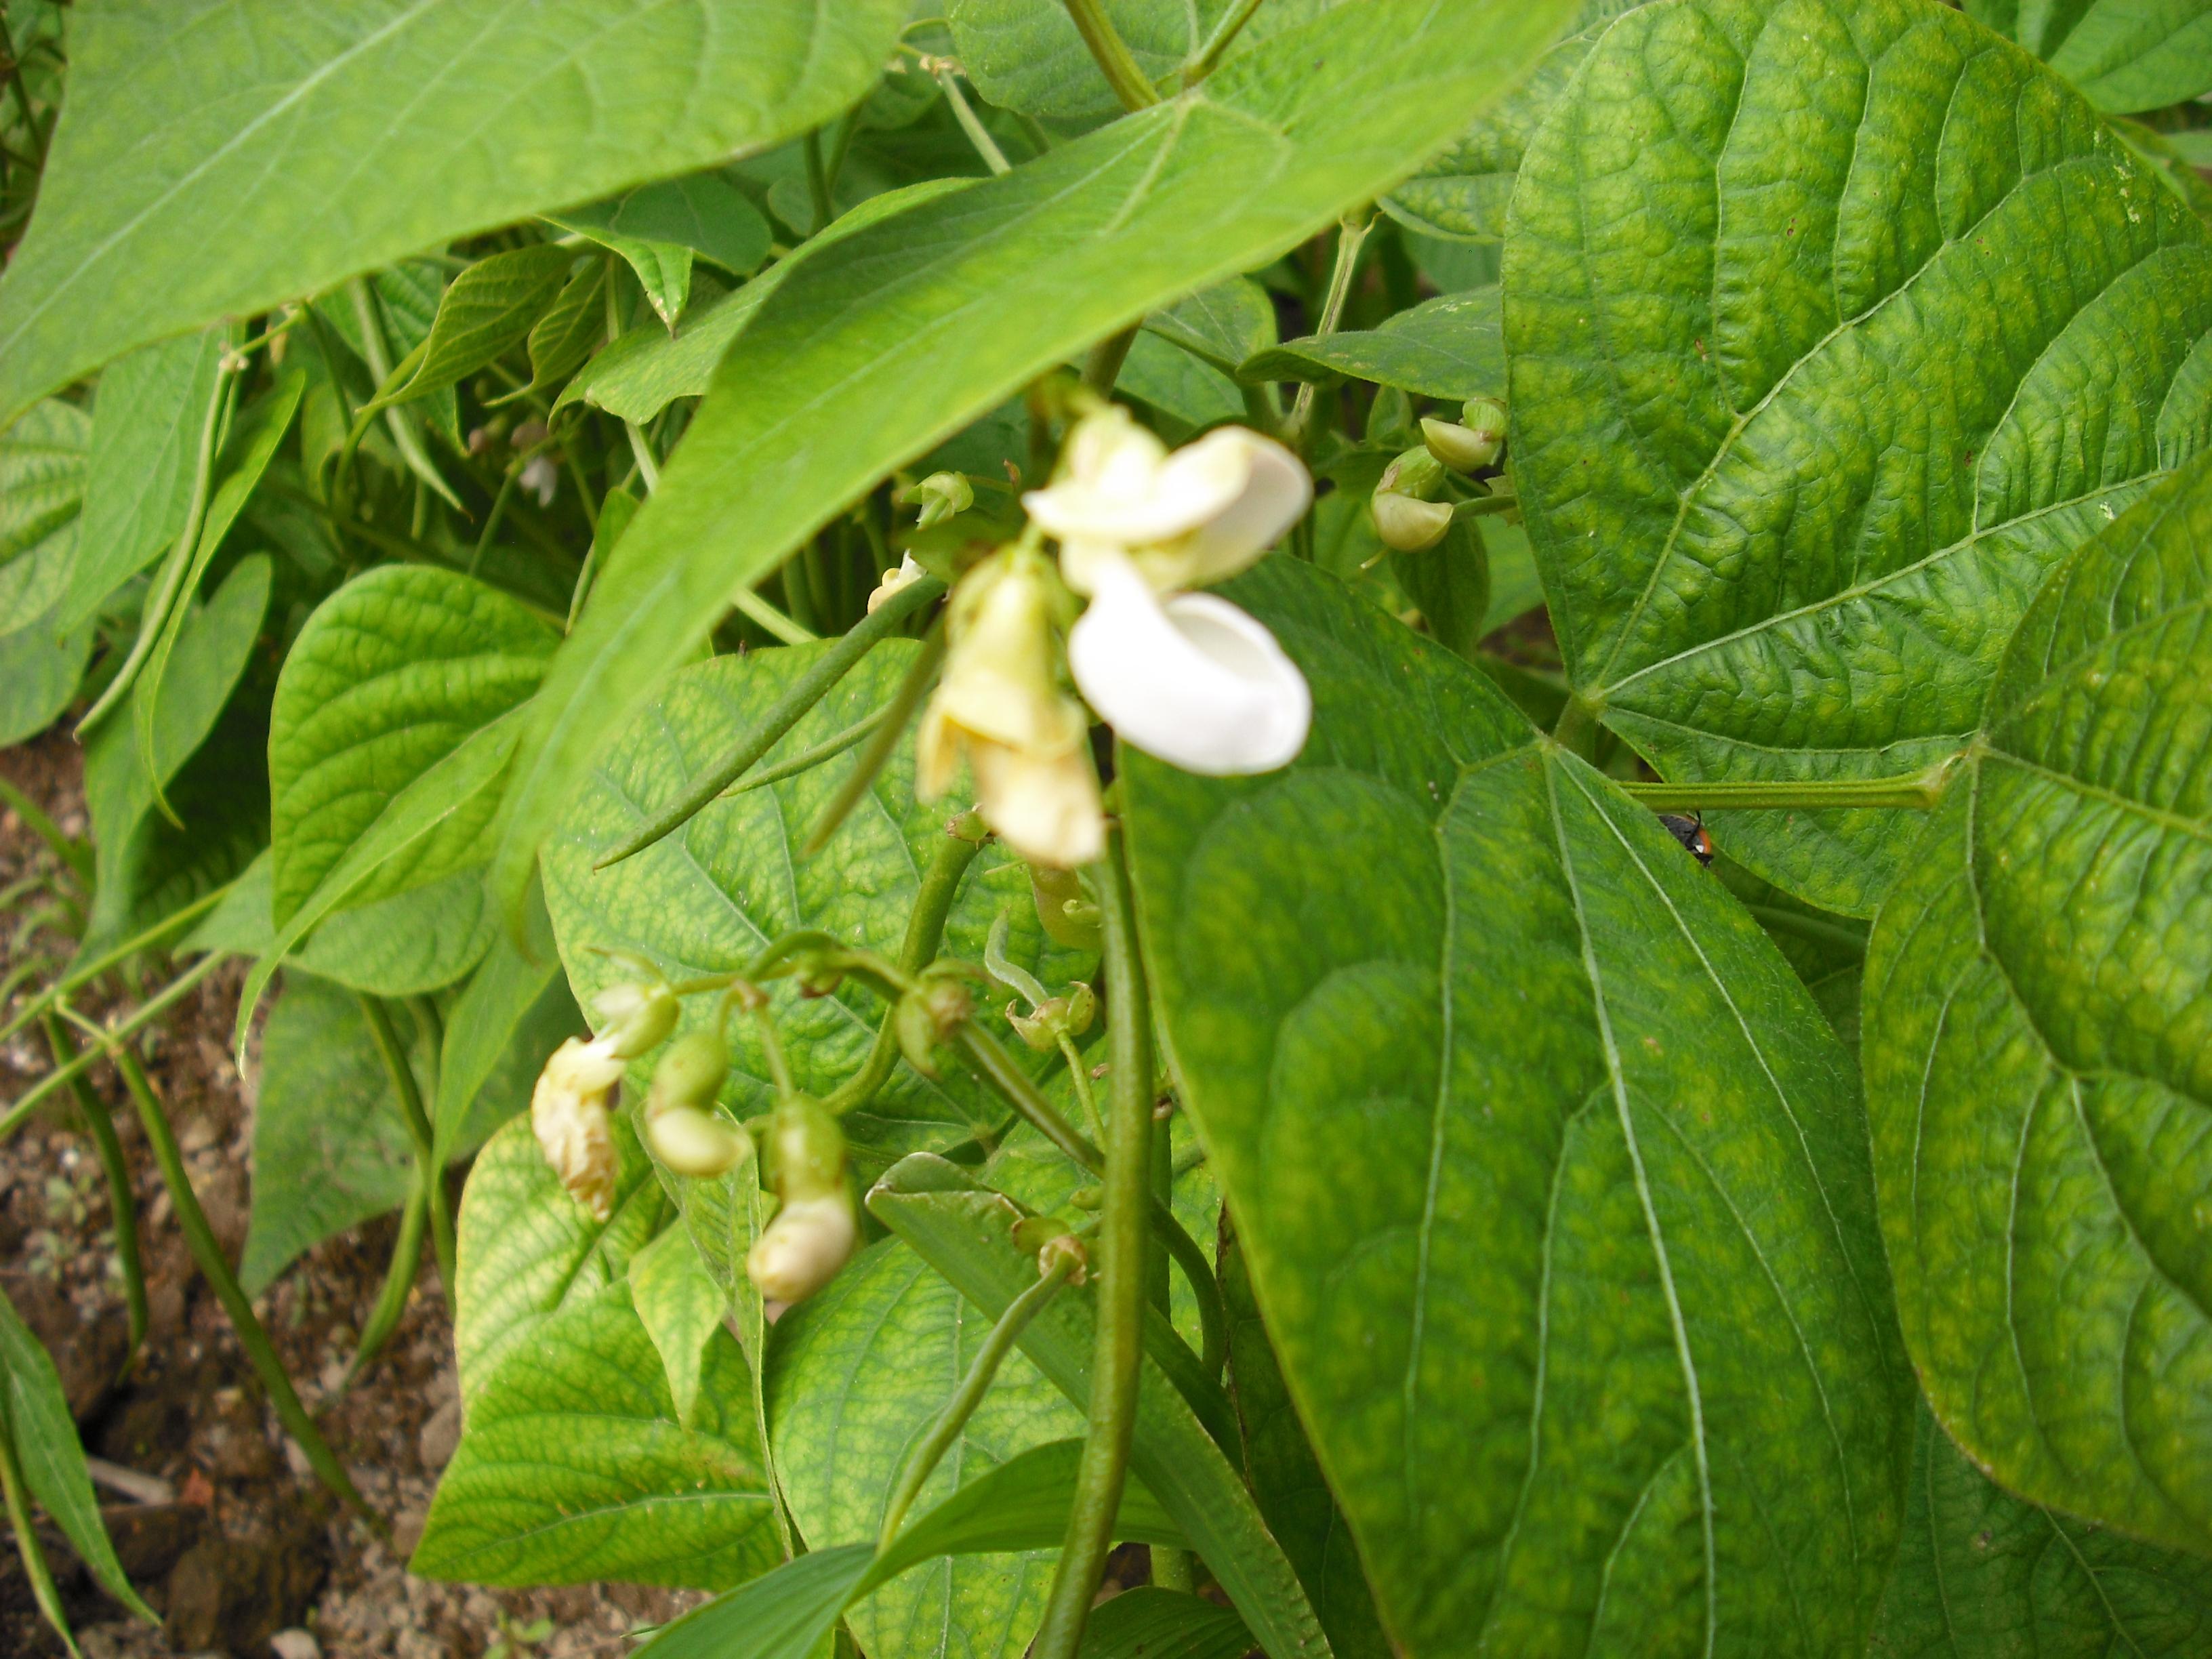 Fleurs d 39 haricots vert les taxinomes - Culture haricot vert plein champ ...